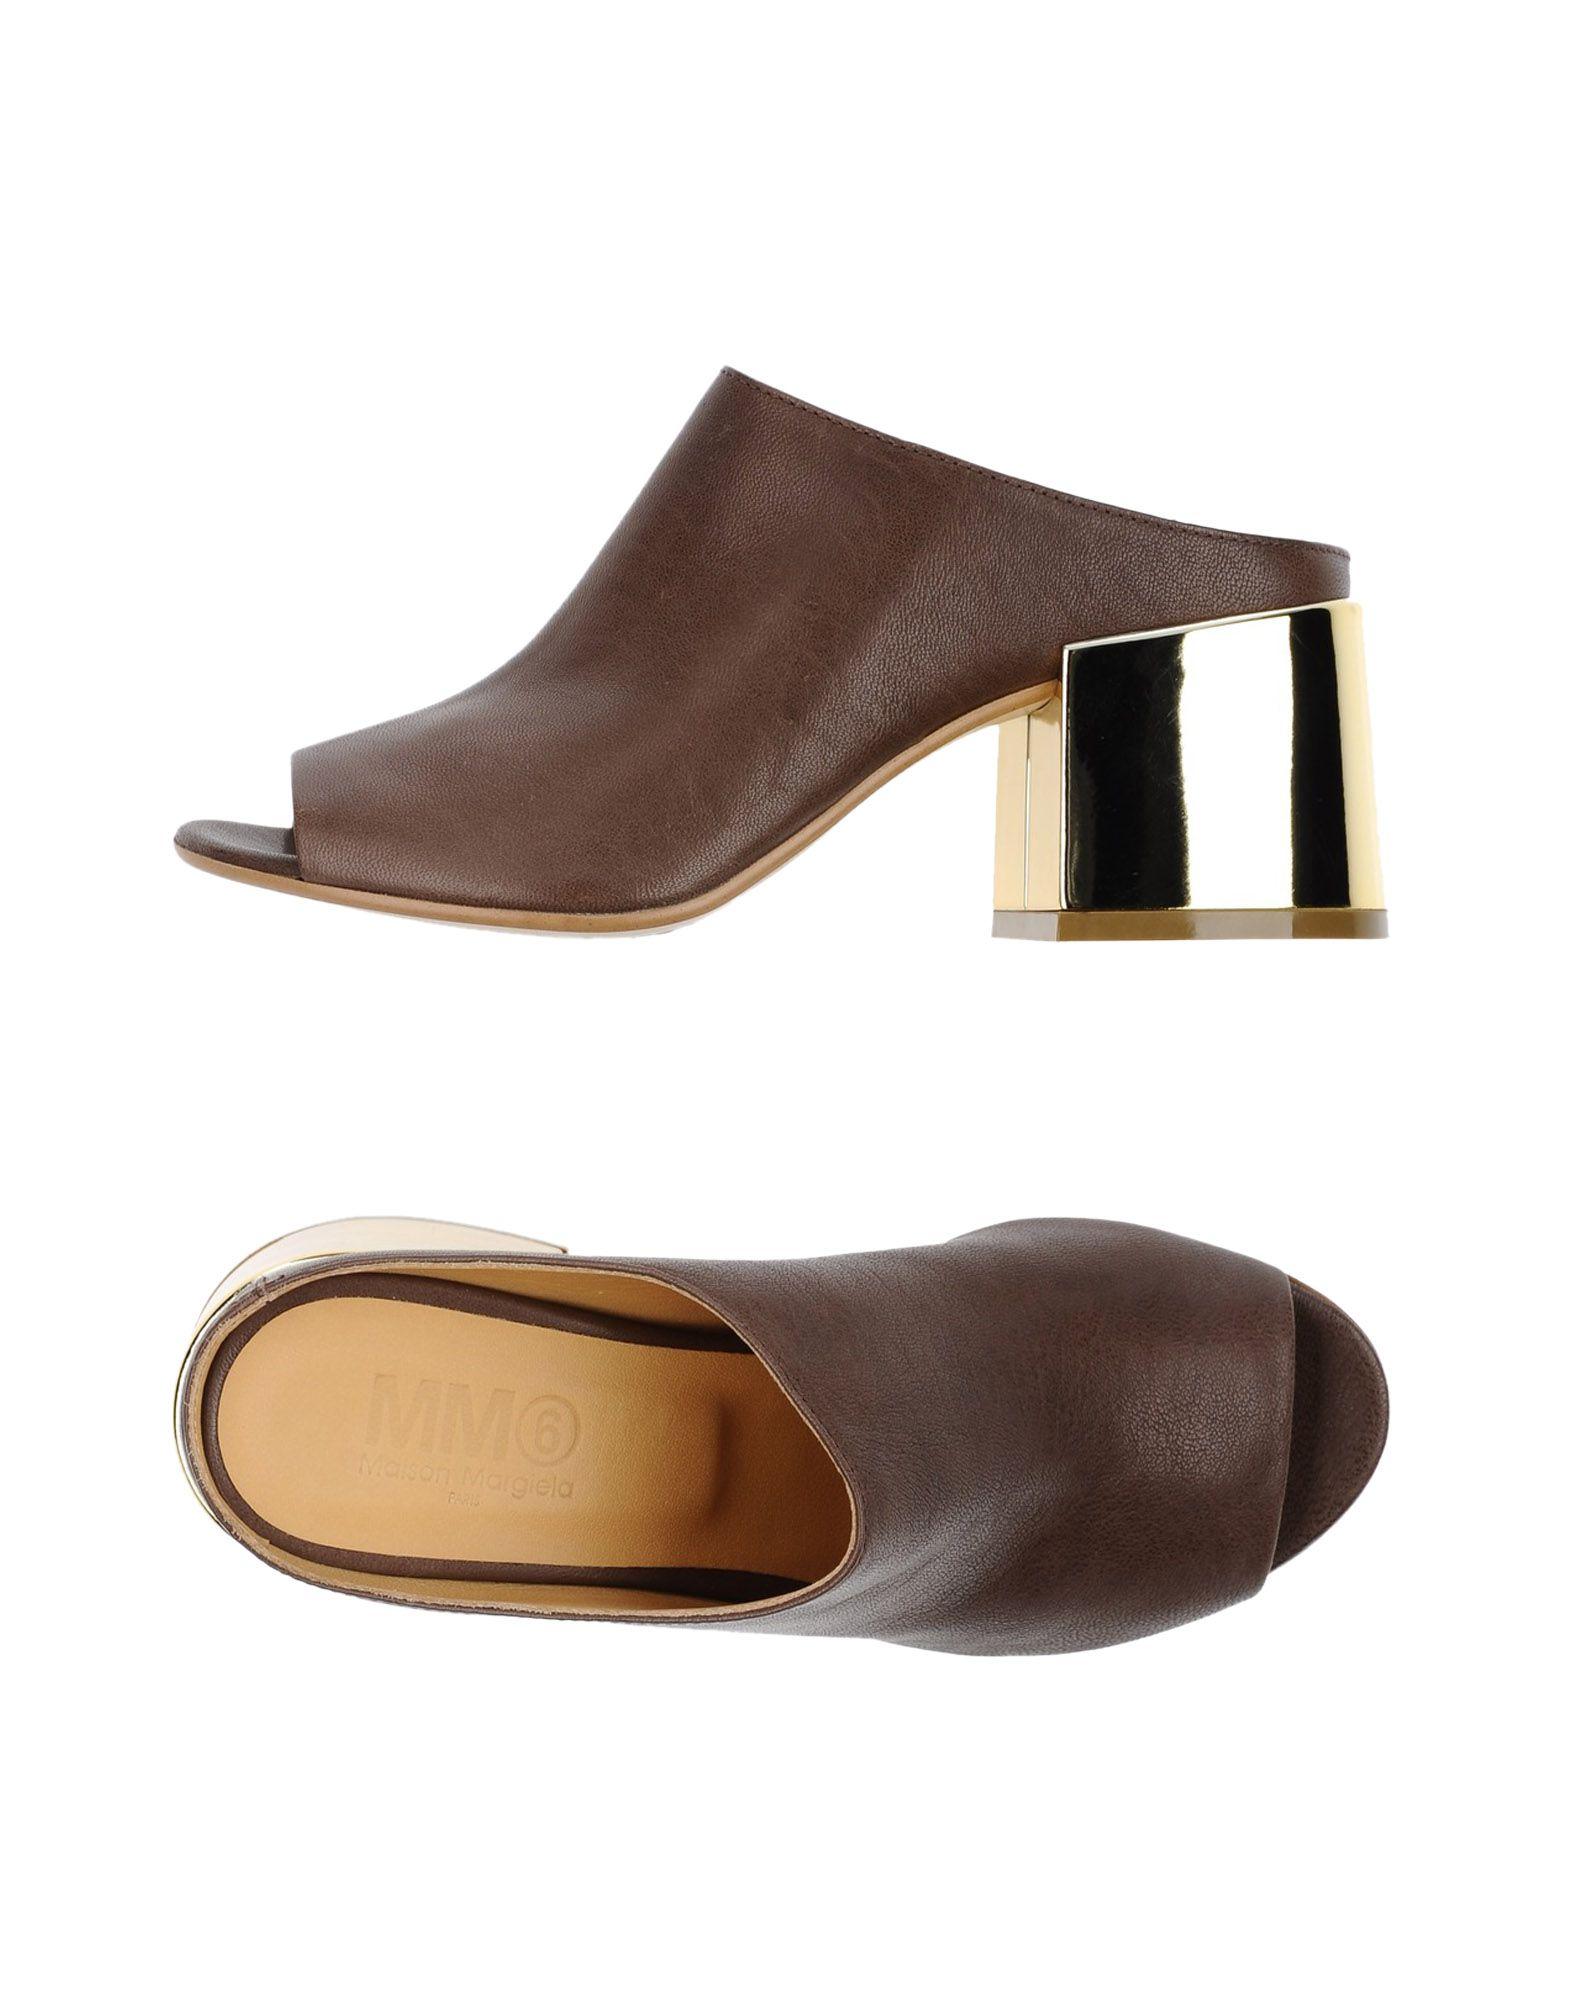 Stilvolle billige Sandalen Schuhe Mm6 Maison Margiela Sandalen billige Damen  11331184II 98718c